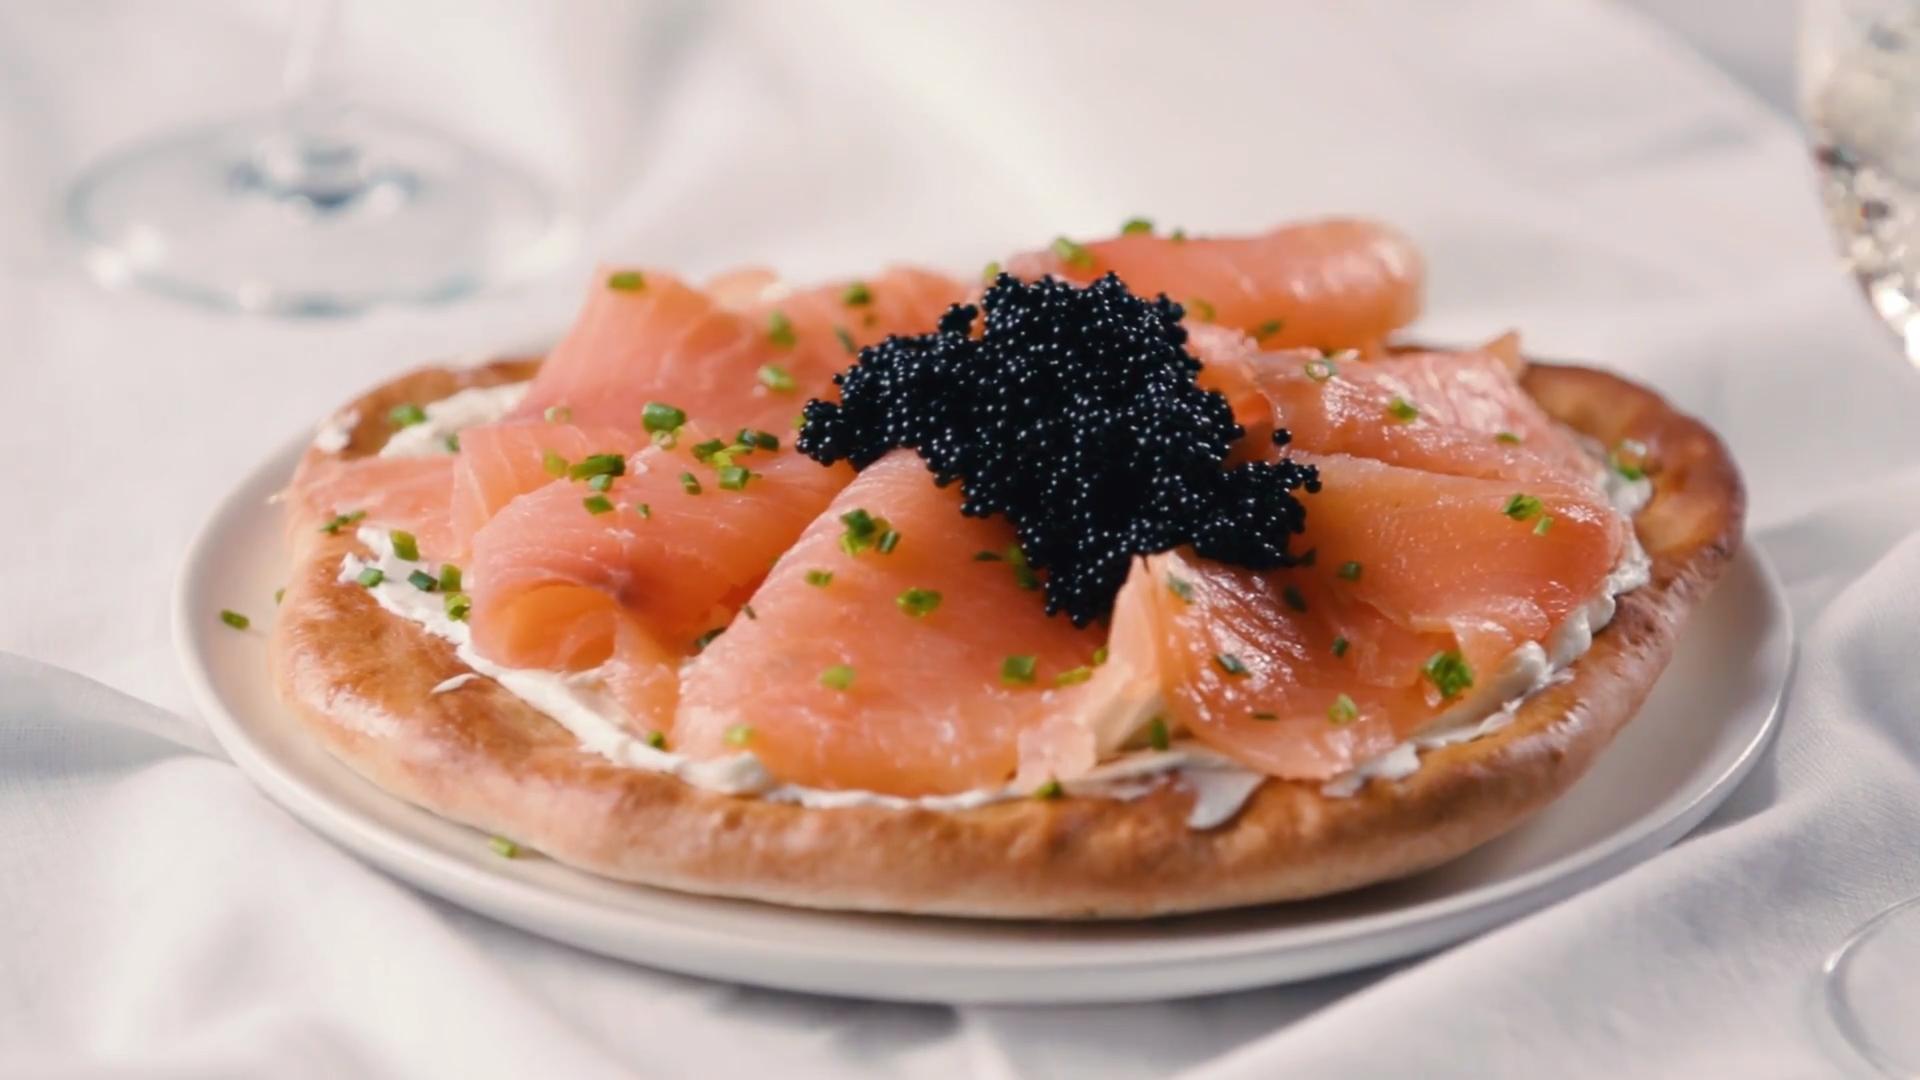 Pizza with Smoked Salmon, Crème Fraîche and Caviar